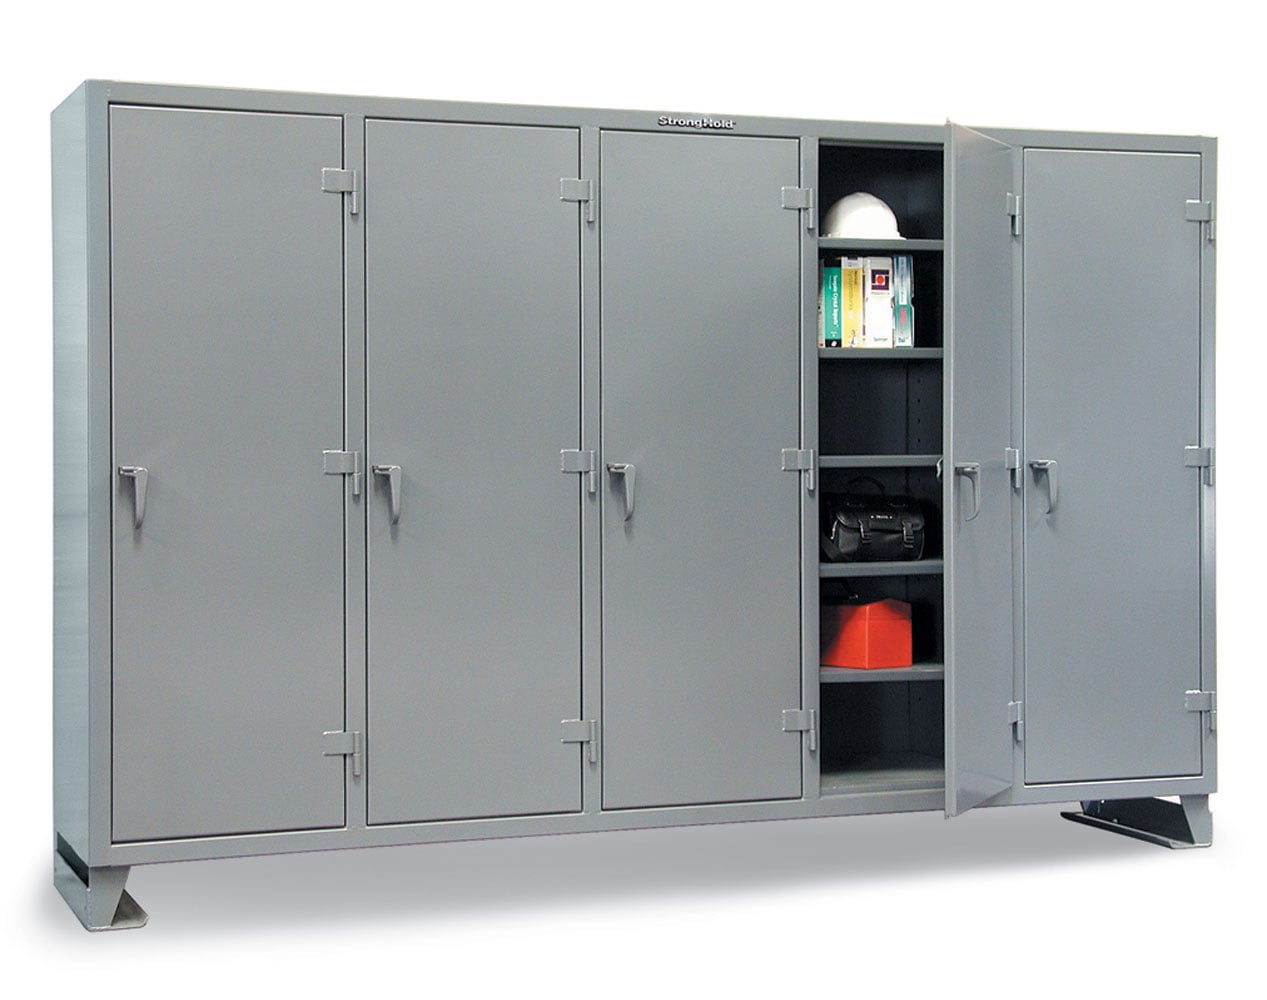 Extra Heavy Duty 12 GA Multi-Shift Cabinet with 25 Shelves – 122 In. W x 24 In. D x 78 In. H